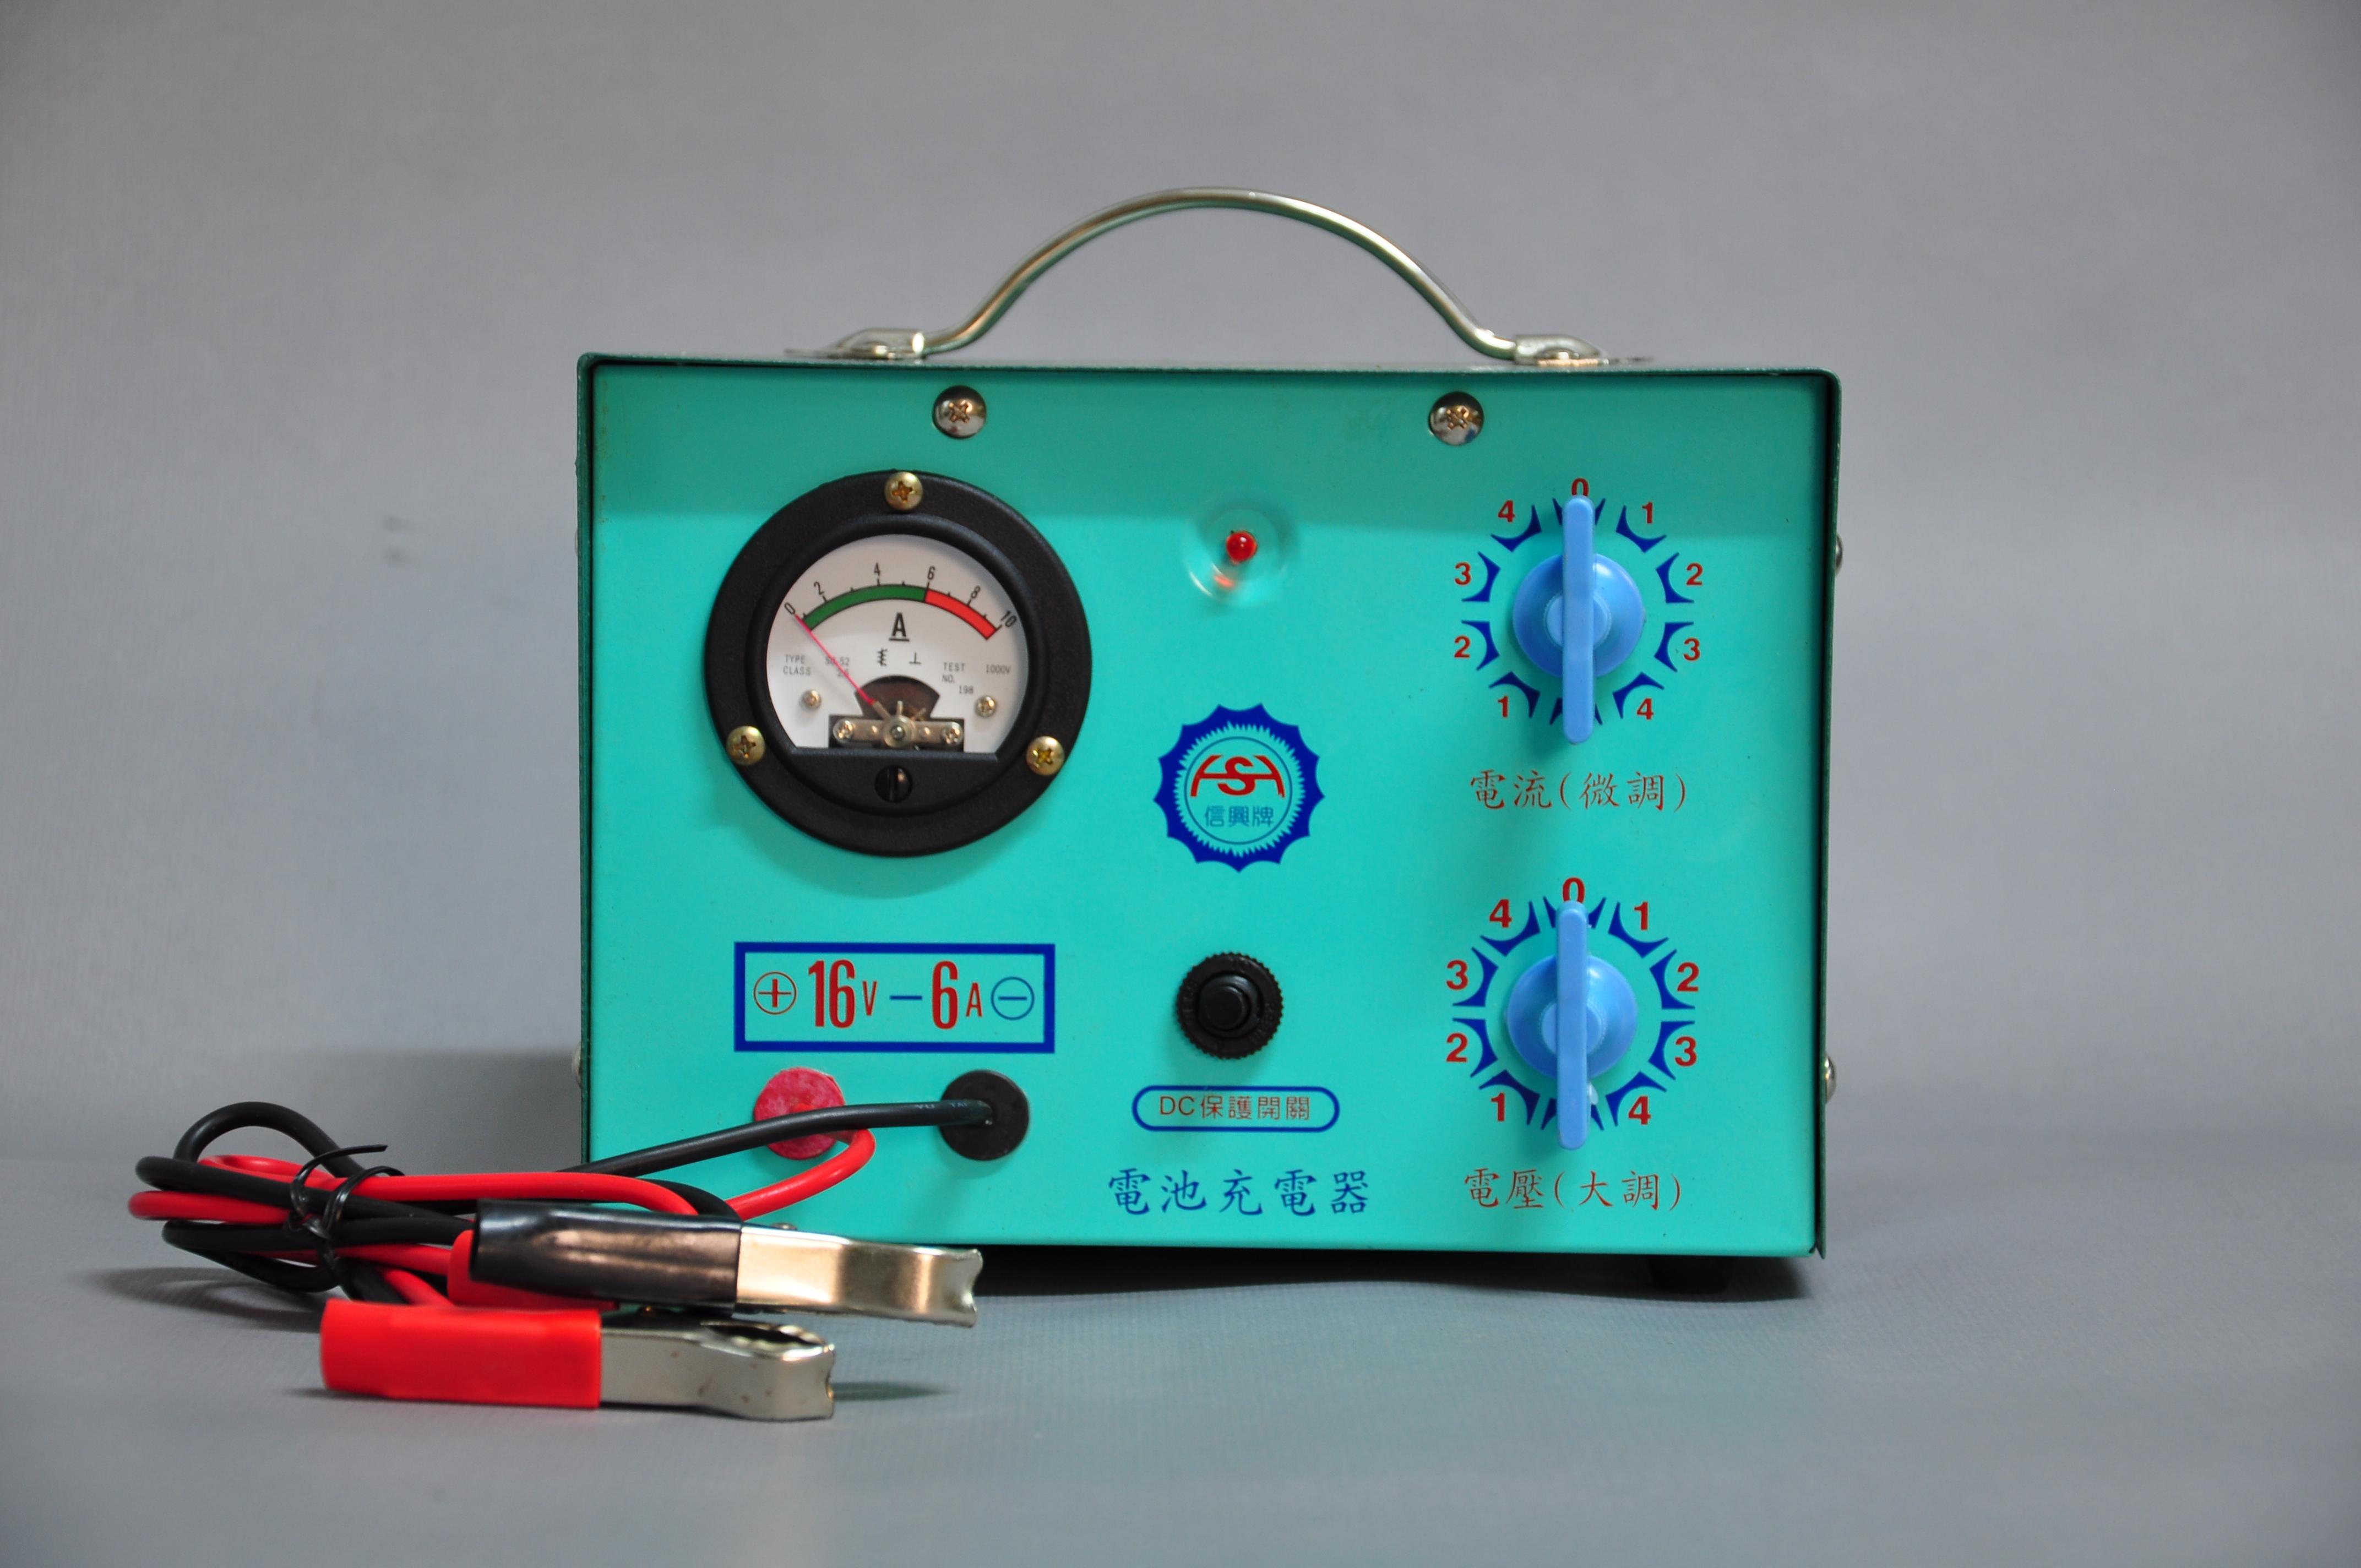 16V-6A電瓶充電器